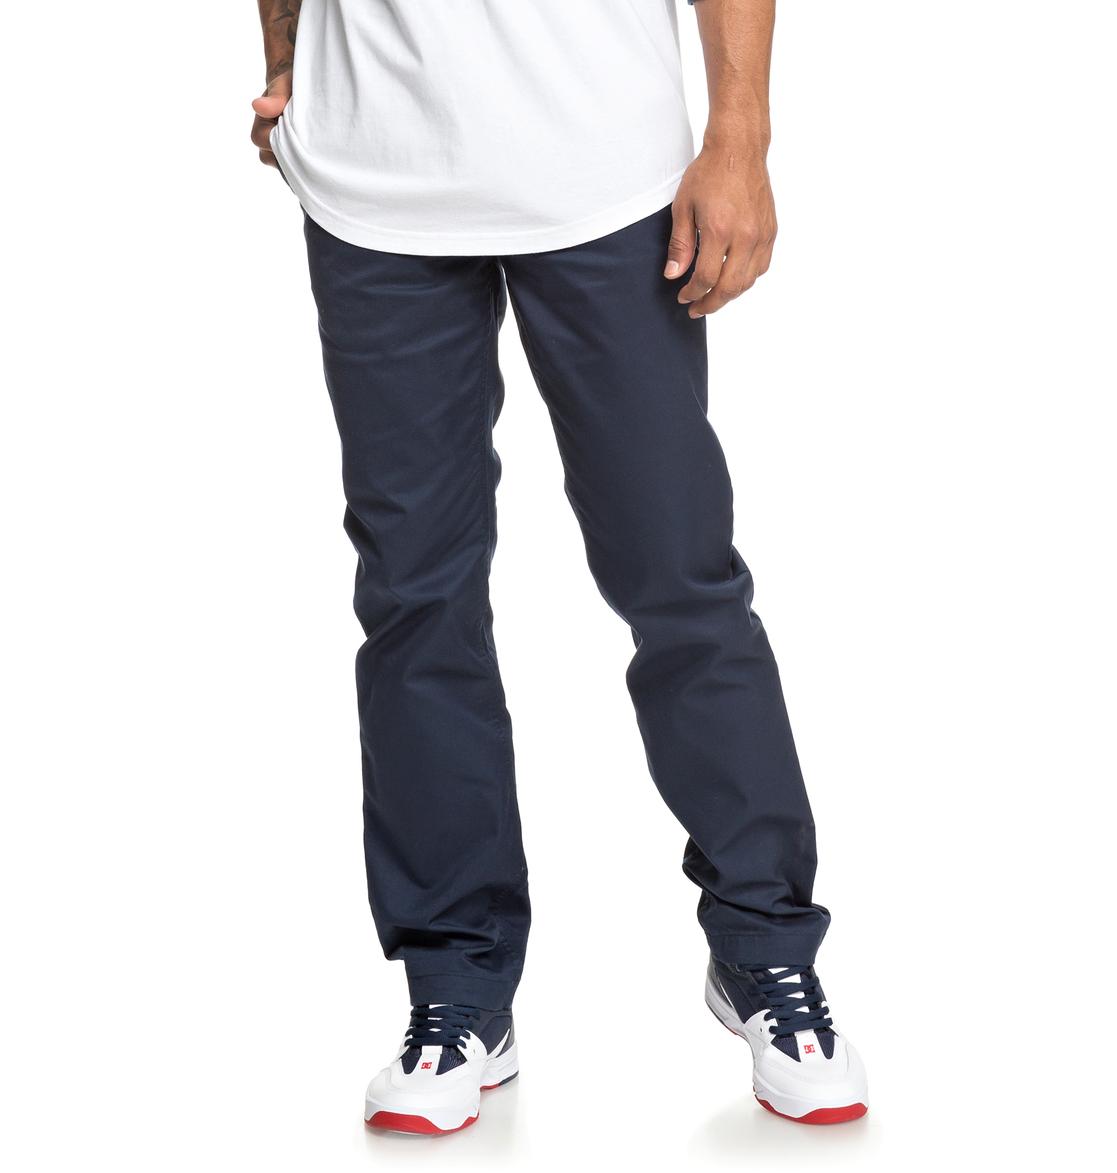 41c0b4df76 0 Worker - Vaqueros de corte recto para Hombre Azul EDYNP03136 DC Shoes